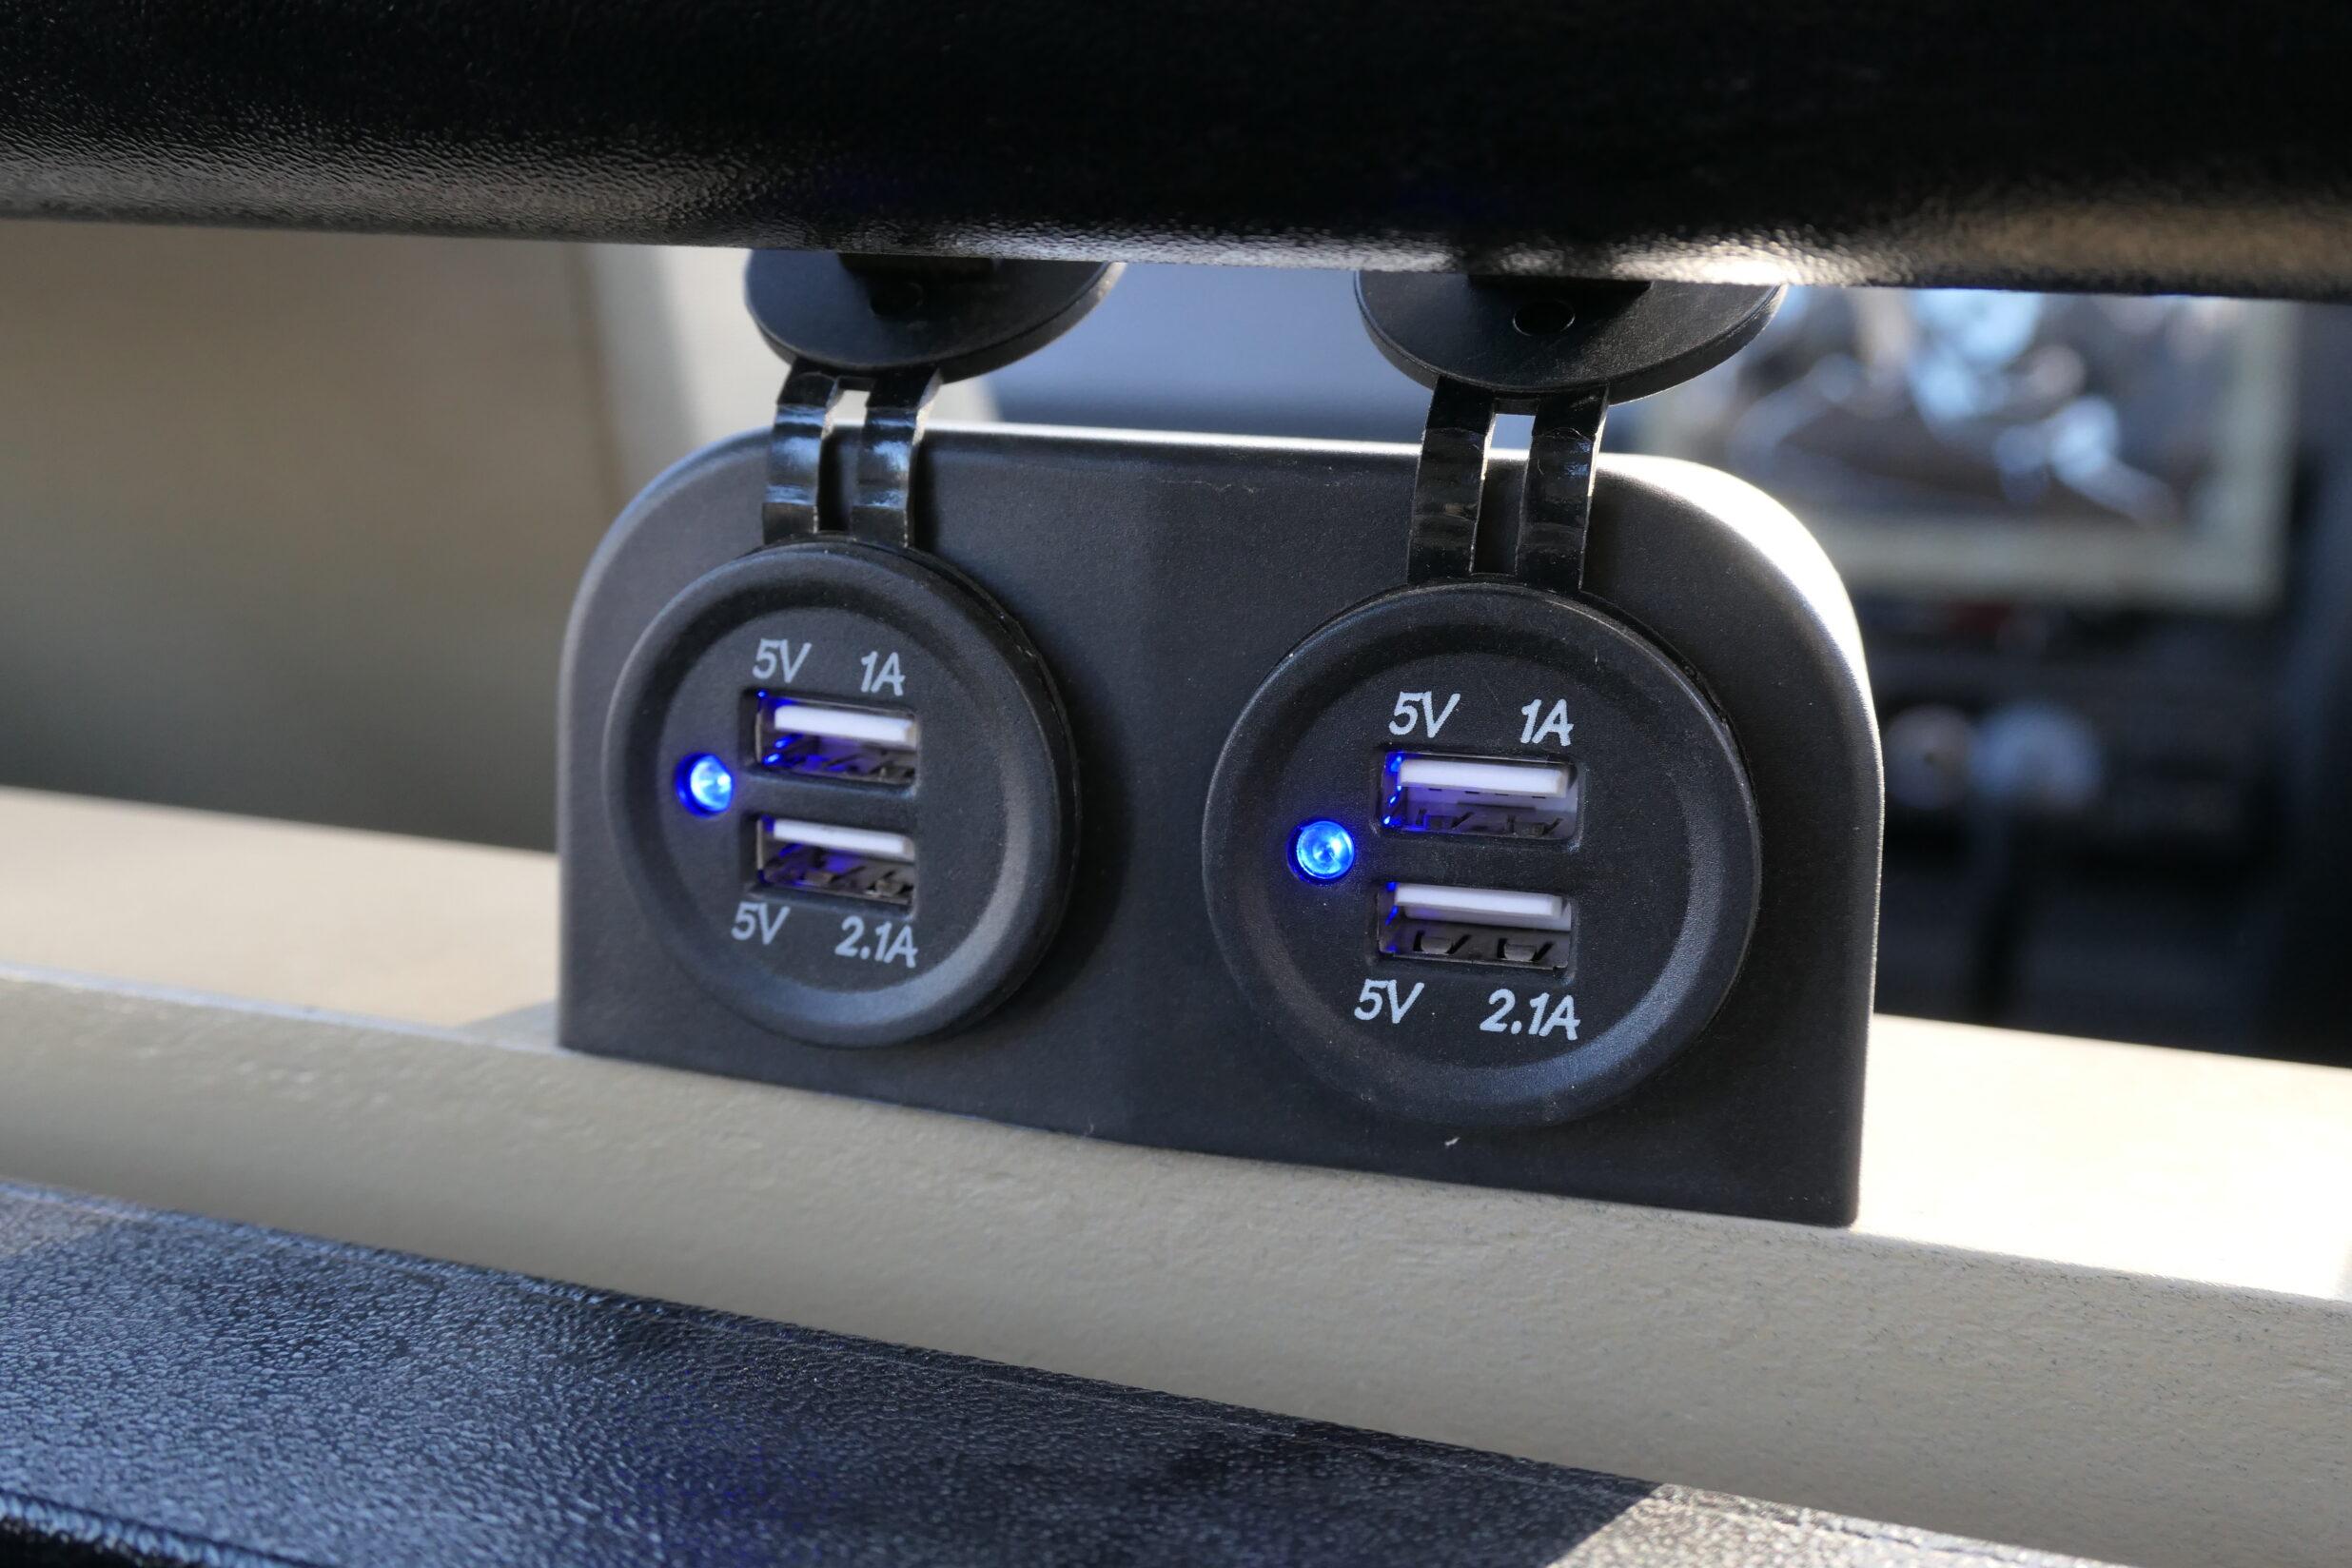 Car USB